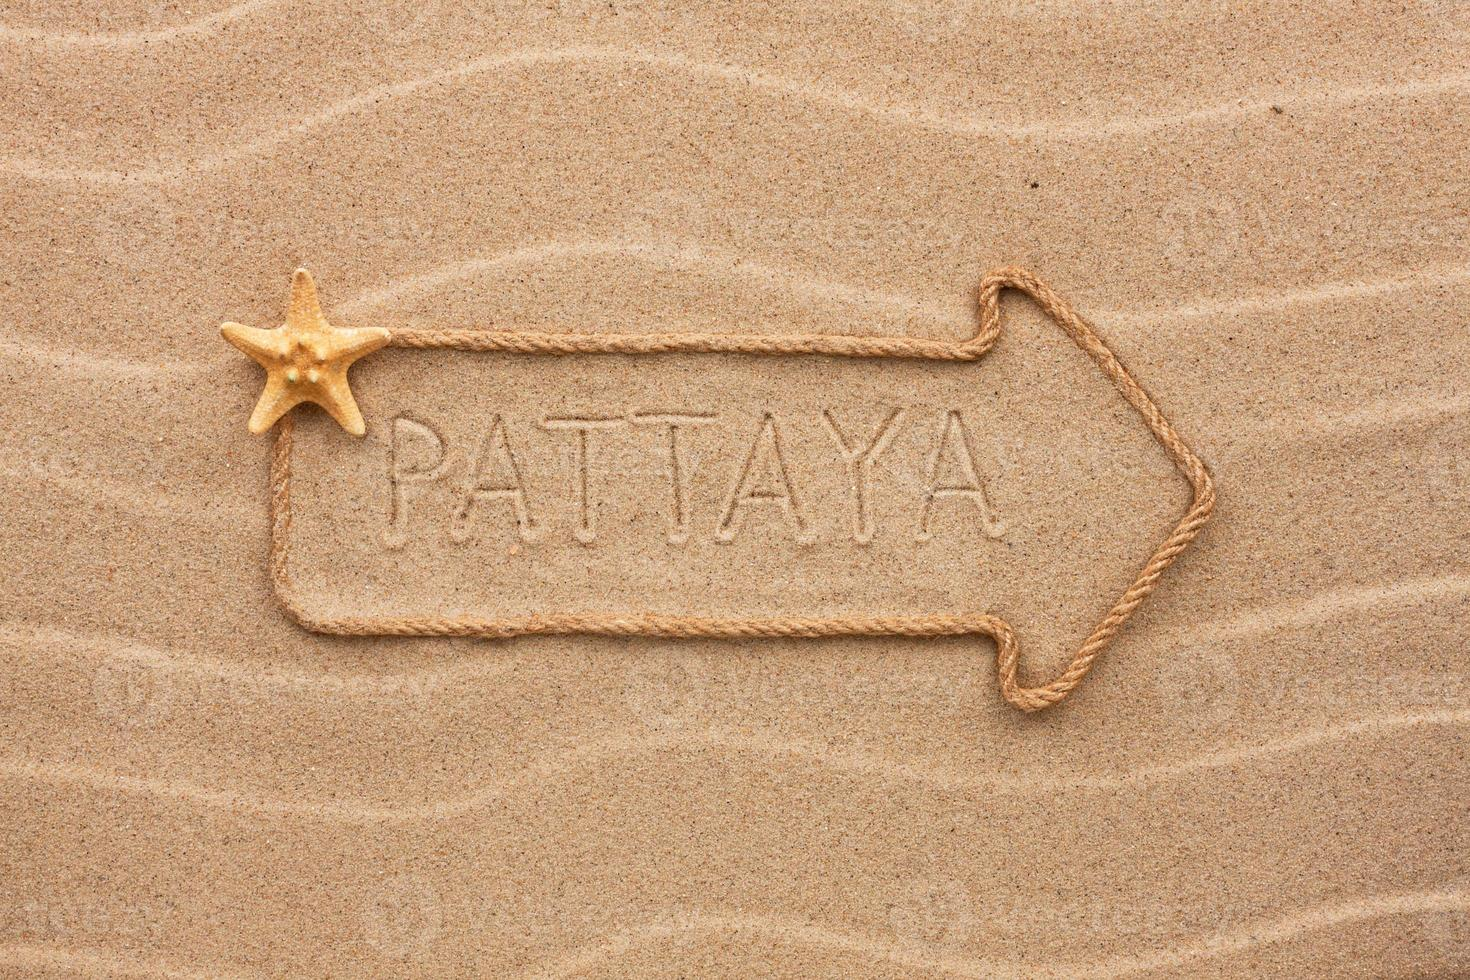 Pfeil aus Seil mit dem Wort Pattaya foto